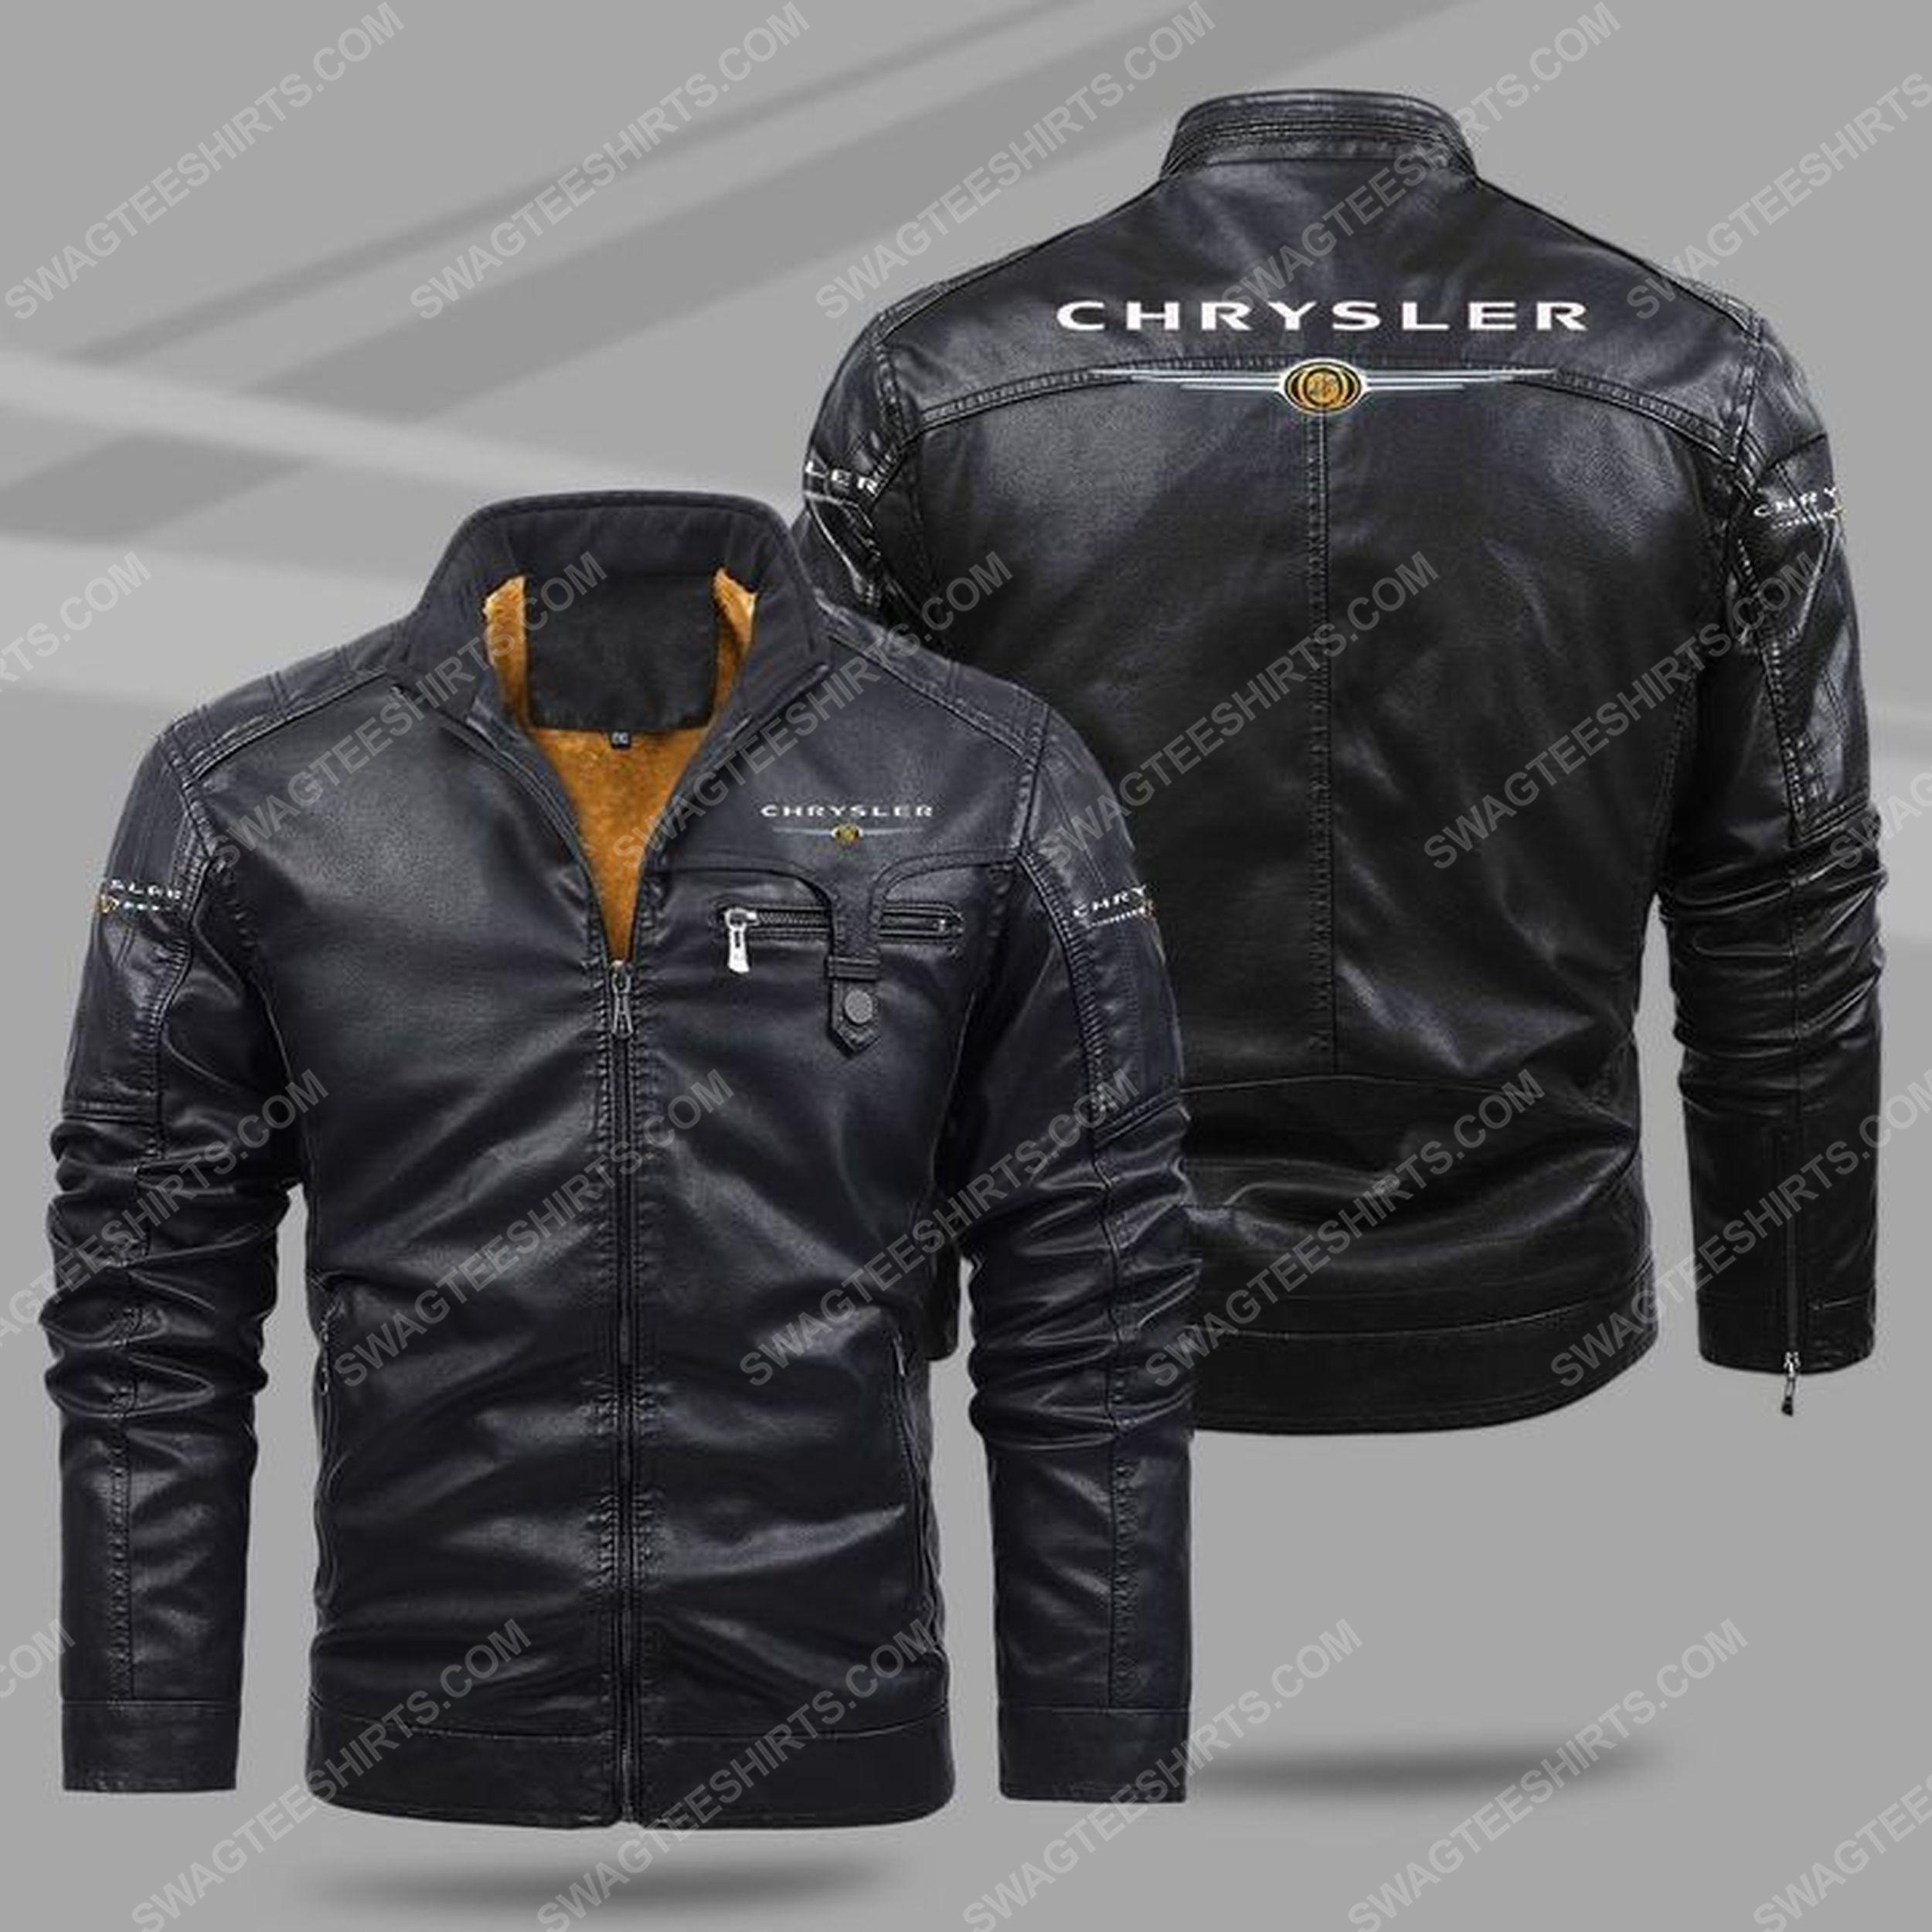 Chrysler car all over print fleece leather jacket